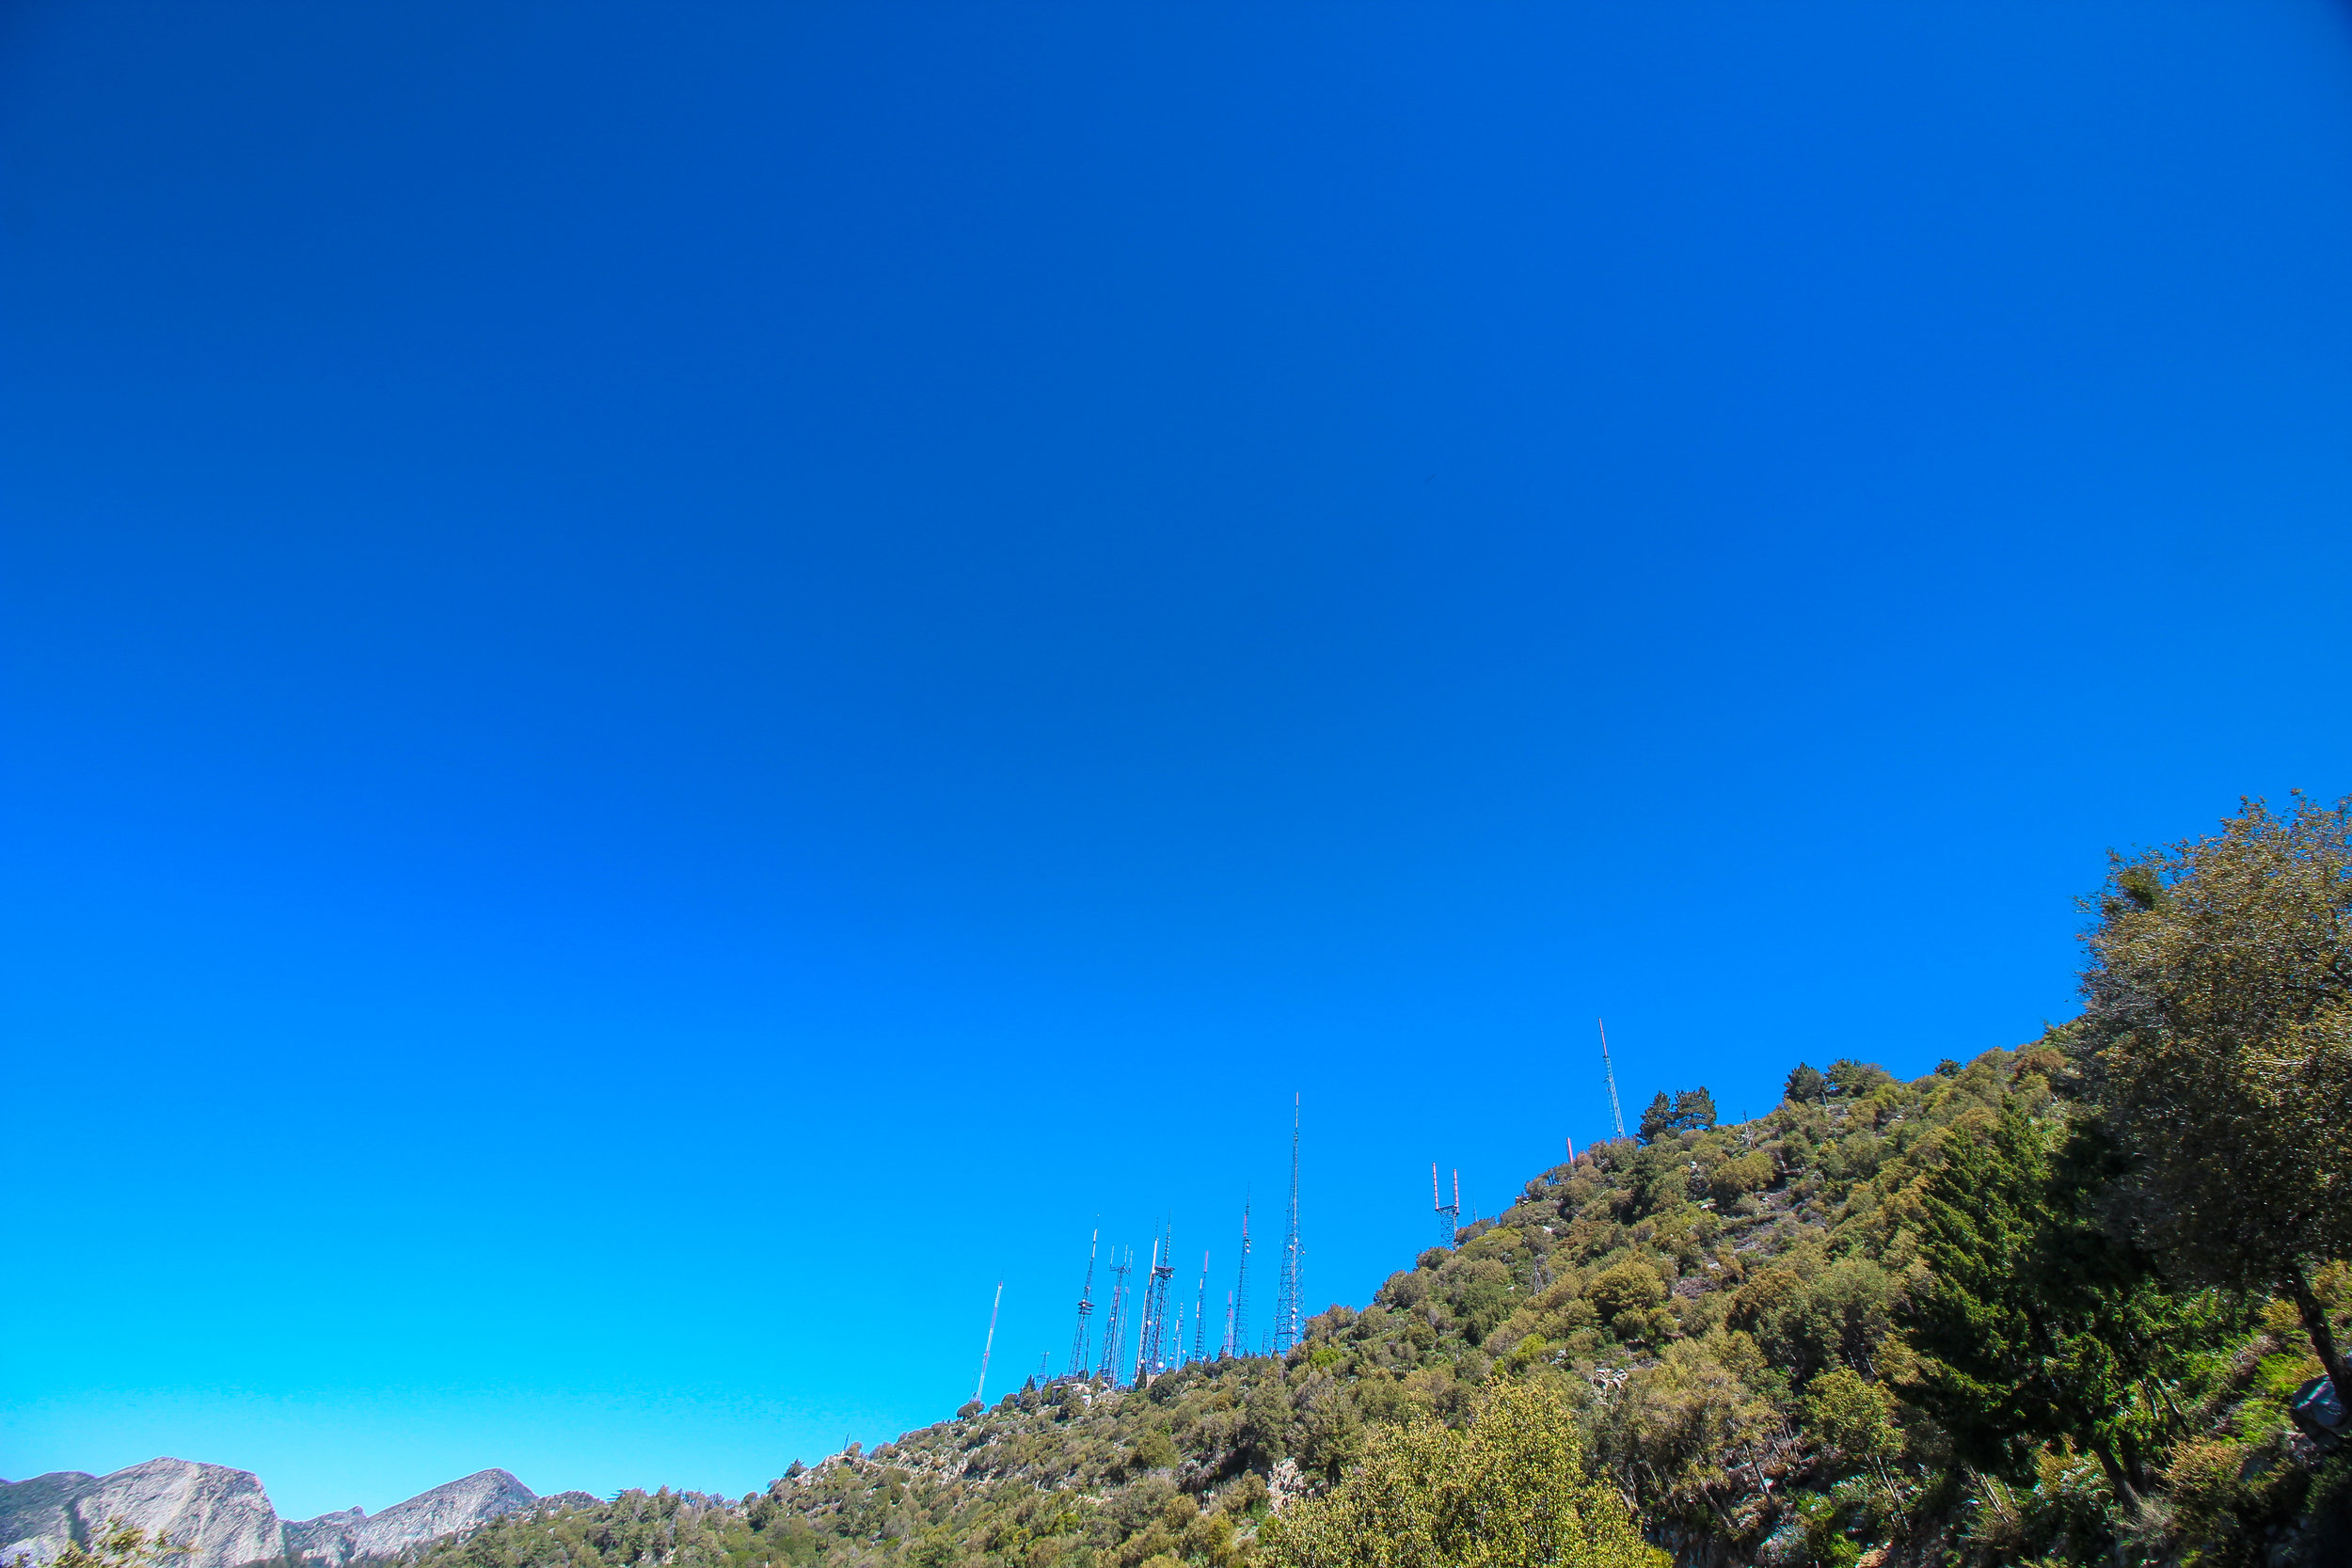 Mt. Wilson Antennas.